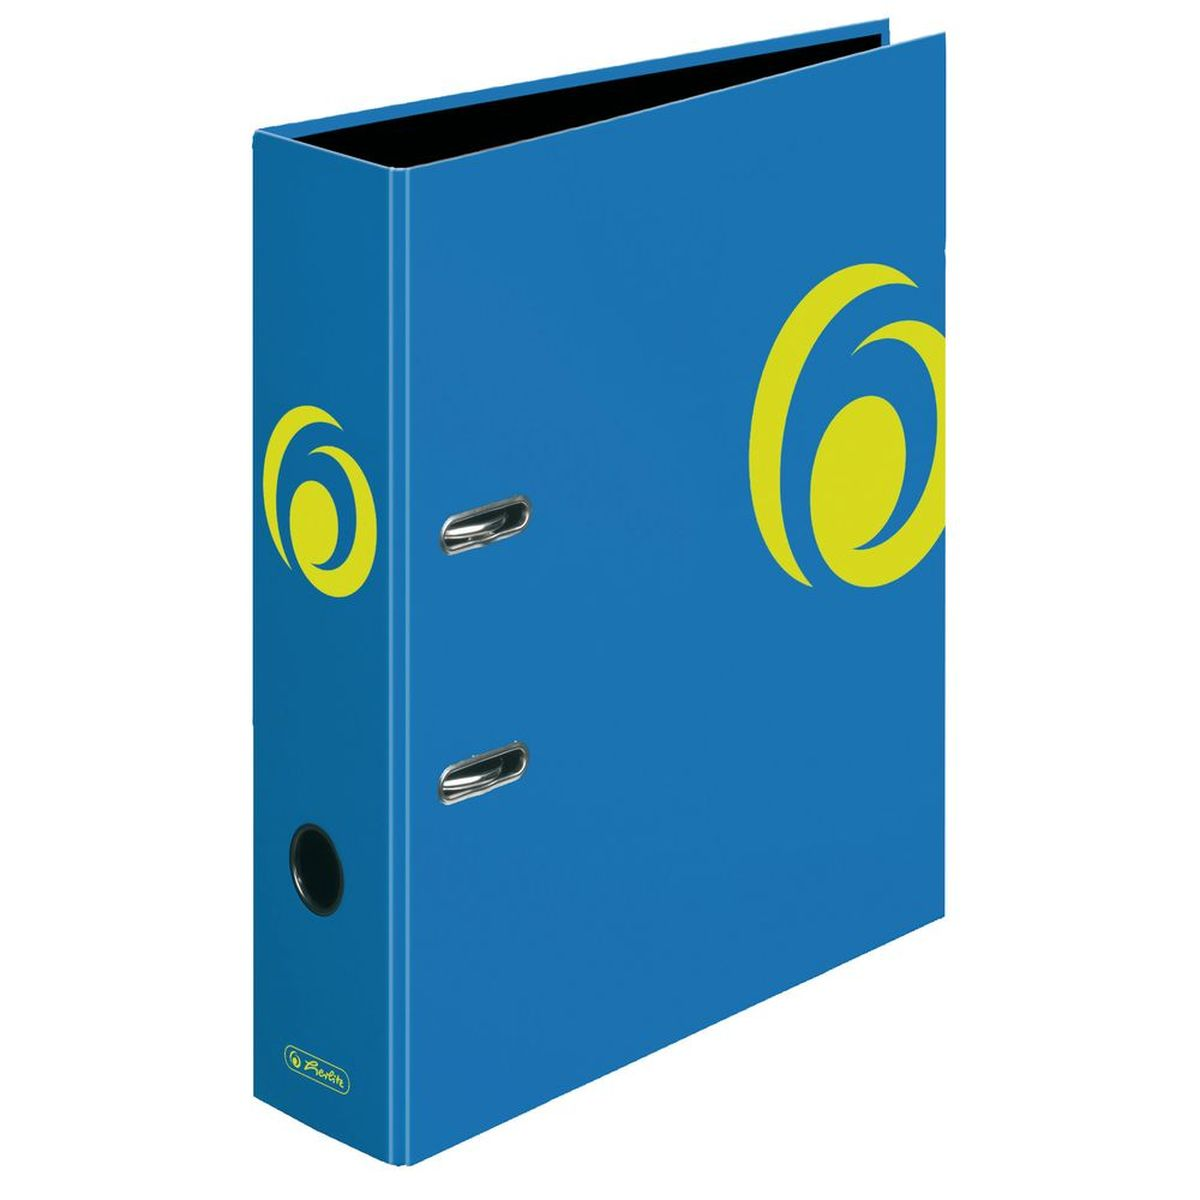 Herlitz Папка-регистратор MaX.file цвет синий